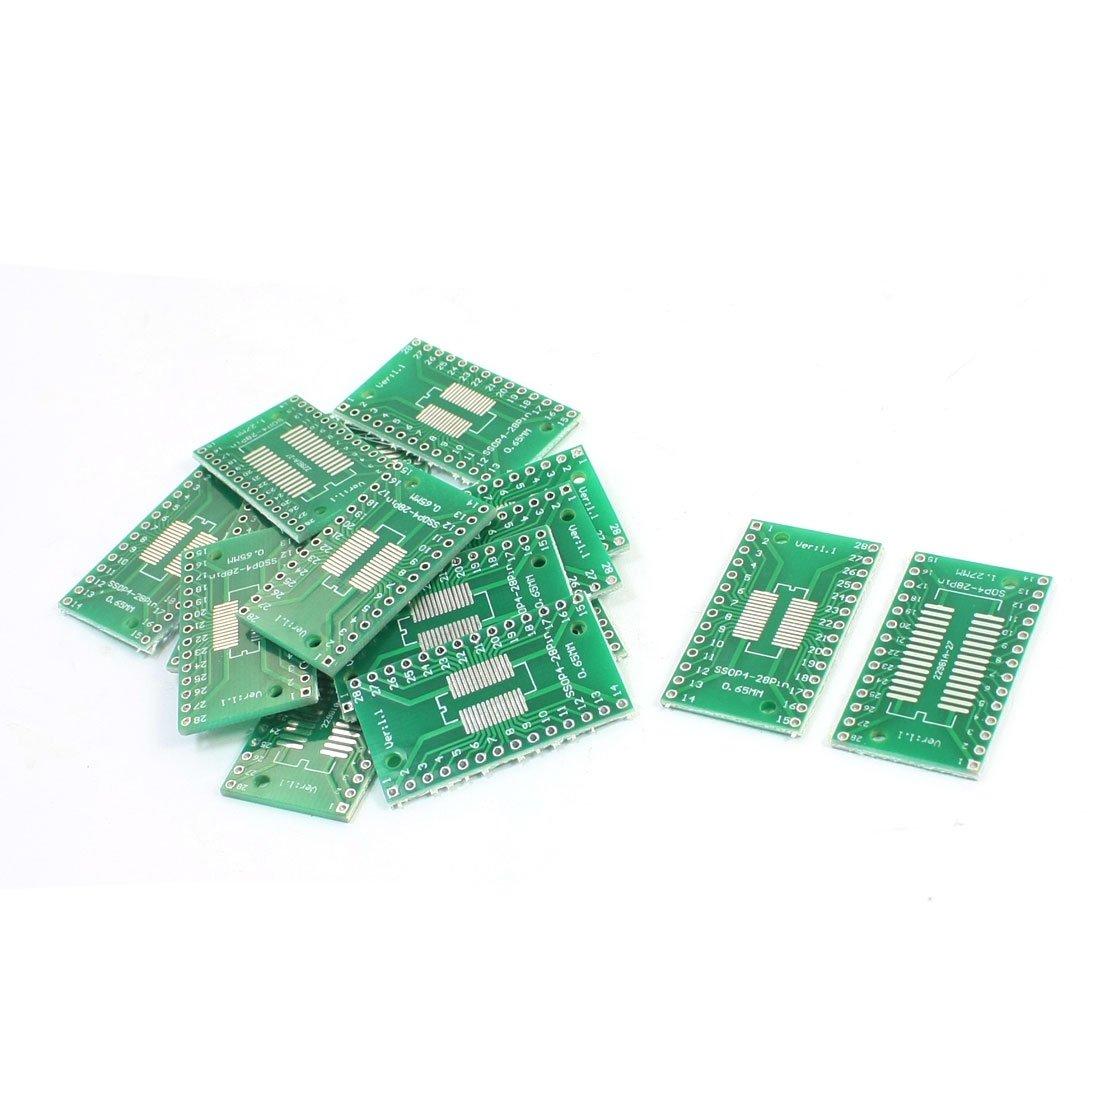 15PCS SMD SOP28 SSOP28 TSSOP28 0.65mm 1.27mm to DIP 2.54mm PCB Adapter uxcell a14062100ux0256